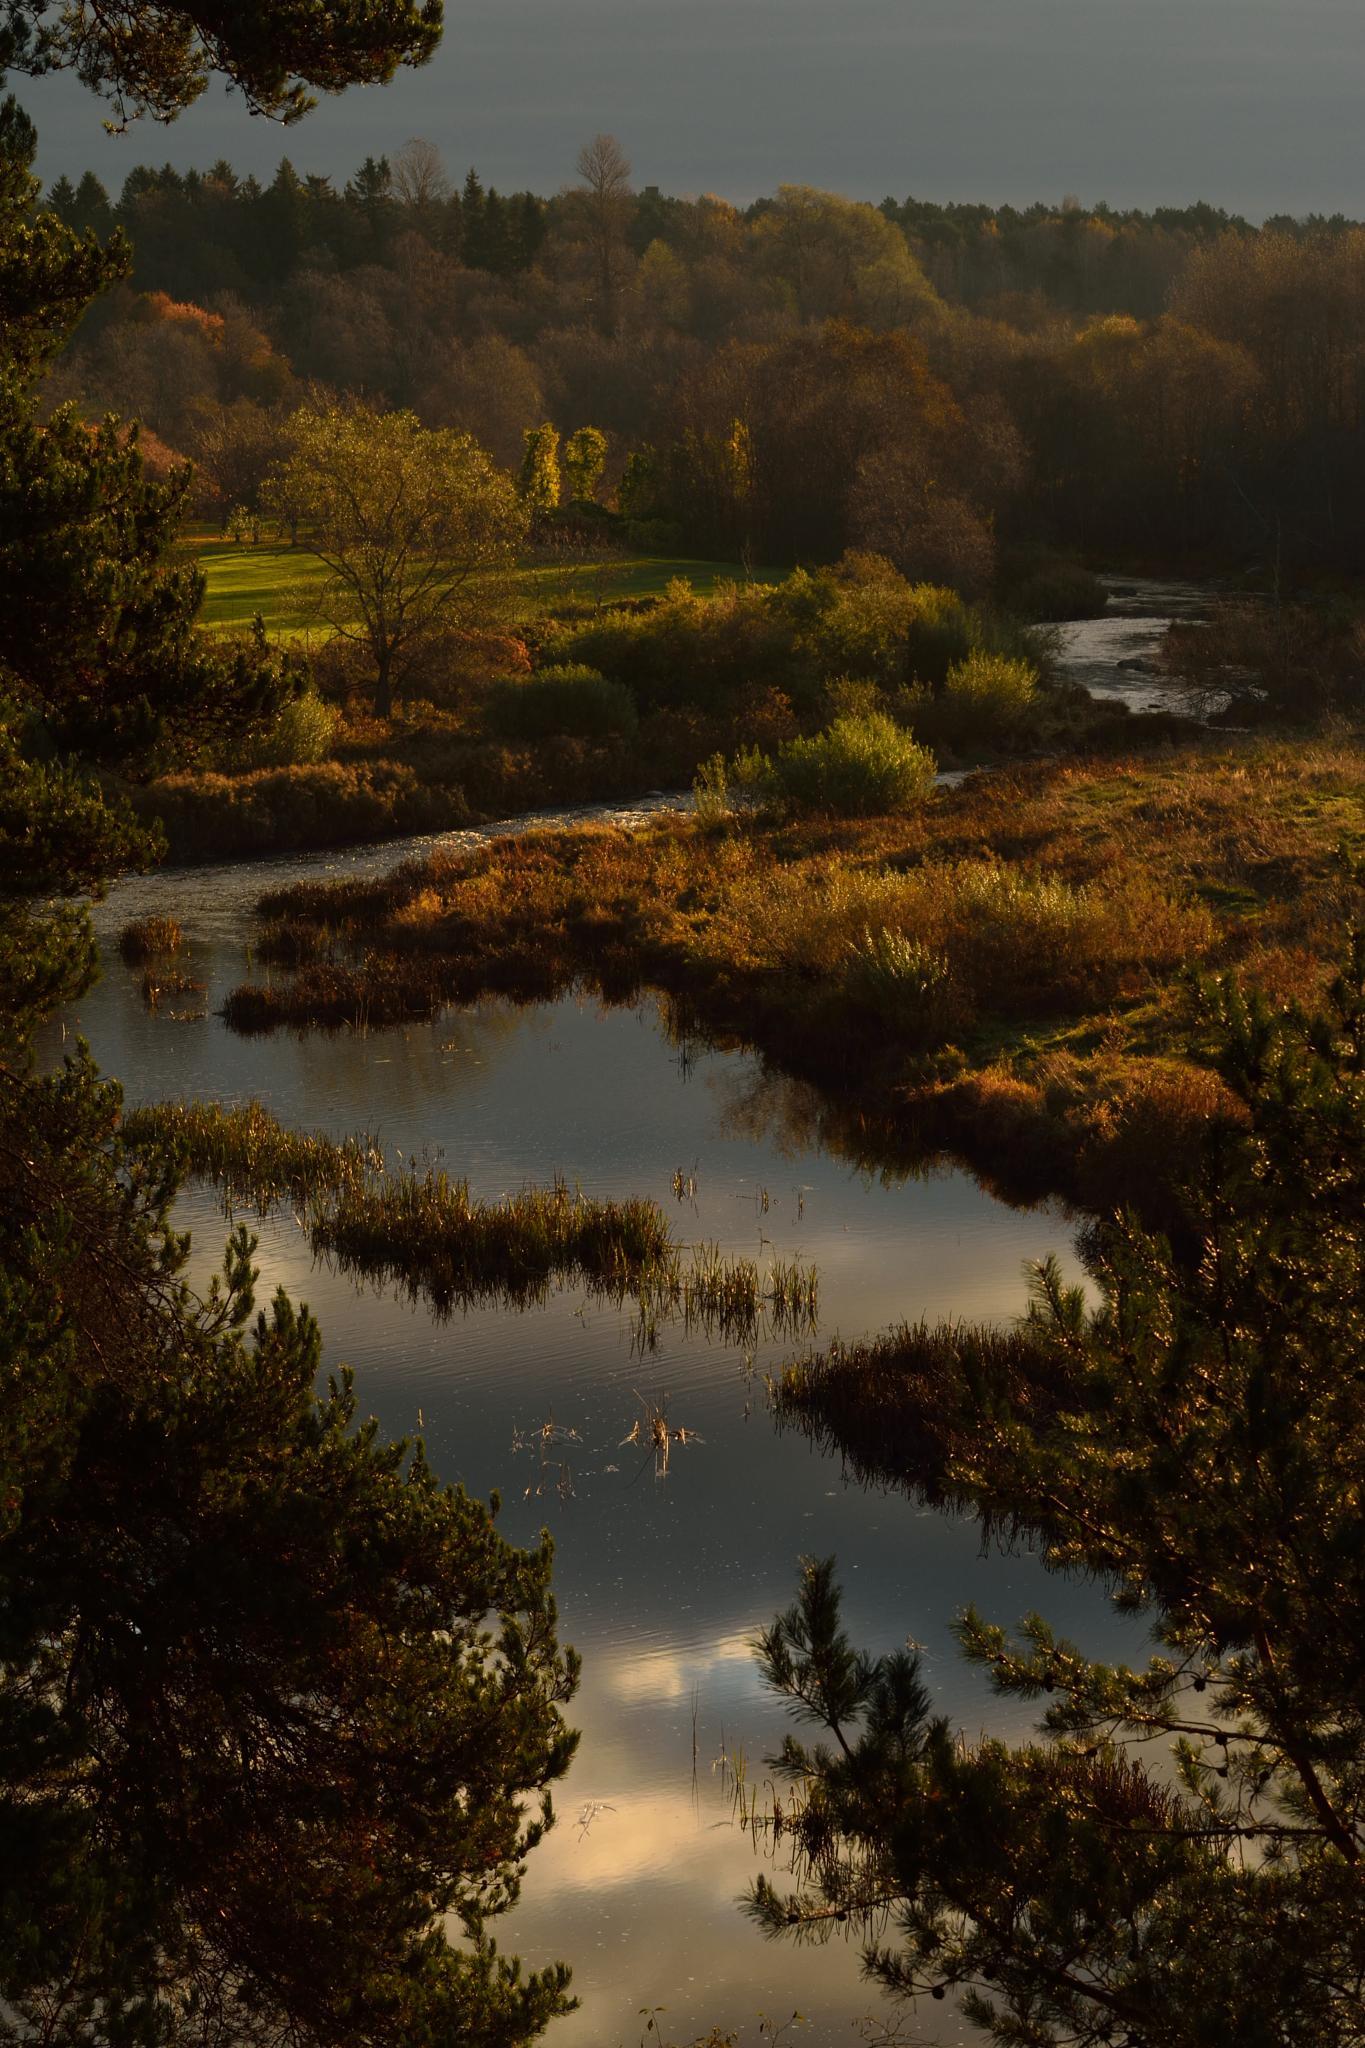 """October"" by Ole Vikshaaland"